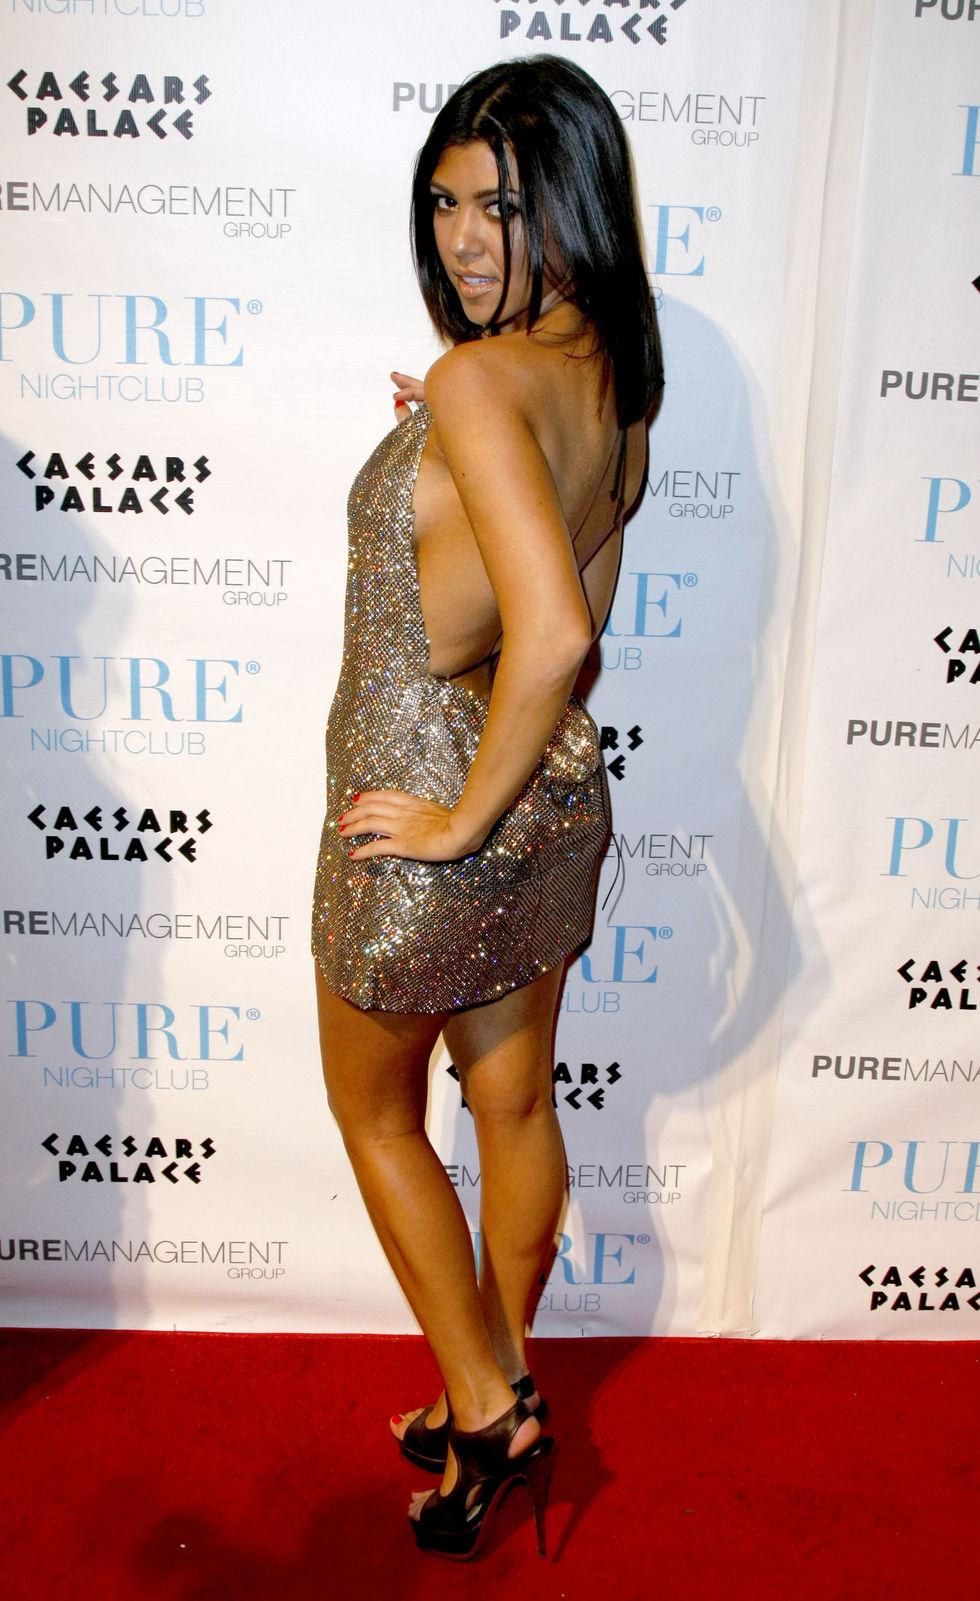 kim-and-kourtney-kardashian-purefection-at-pure-nightclub-in-las-vegas-01